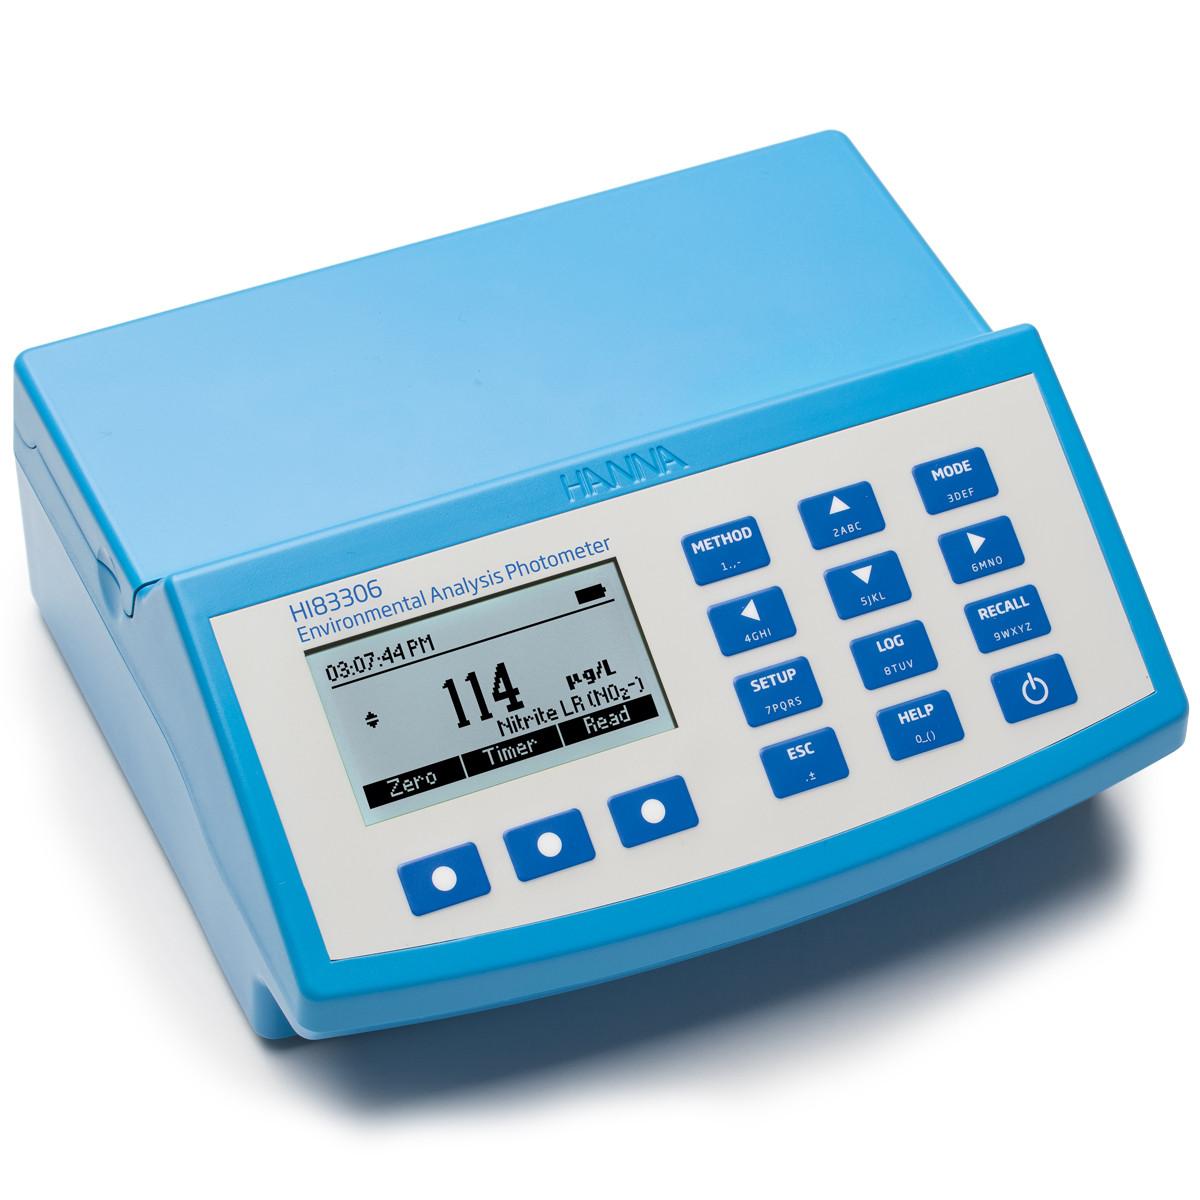 Environmental Analysis Photometer